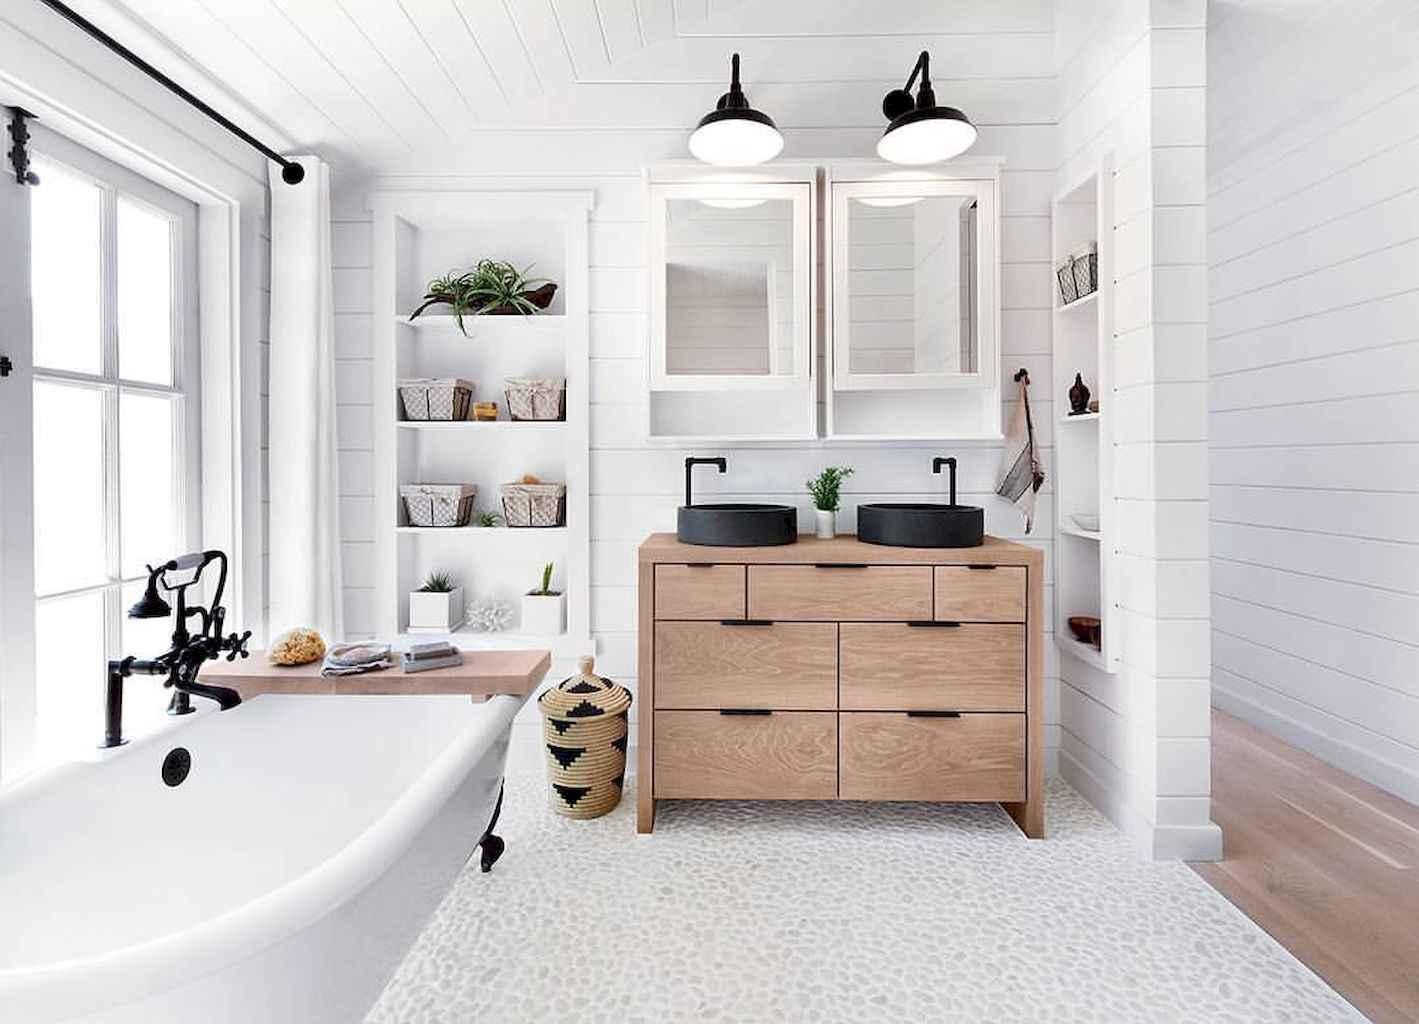 60 Rustic Master Bathroom Remodel Ideas - CoachDecor.com